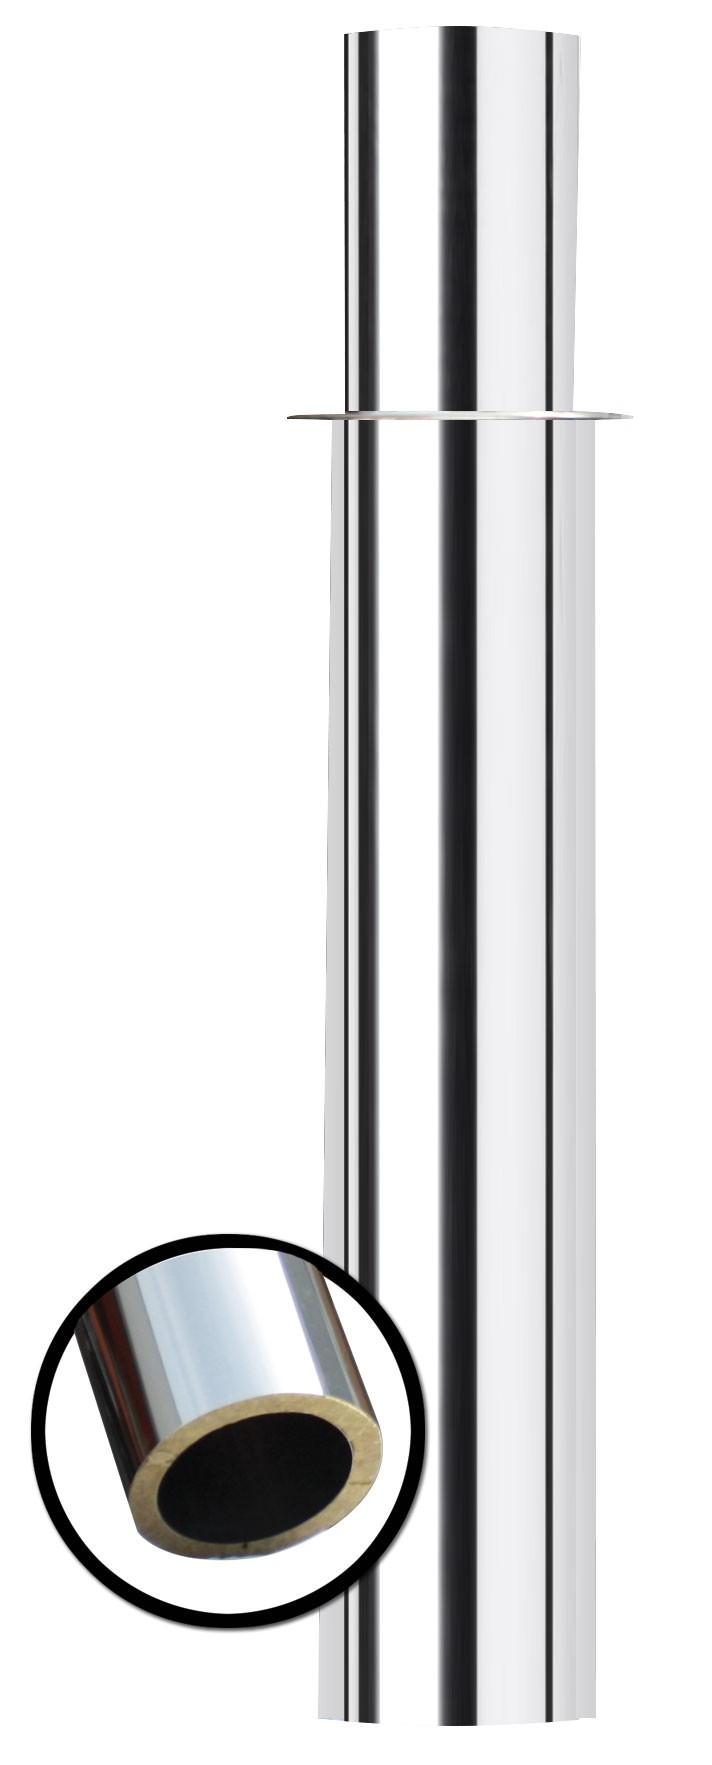 Verlängerungselement Edelstahl ohne Windkat 1000mm Ø 160 mm Bild 1